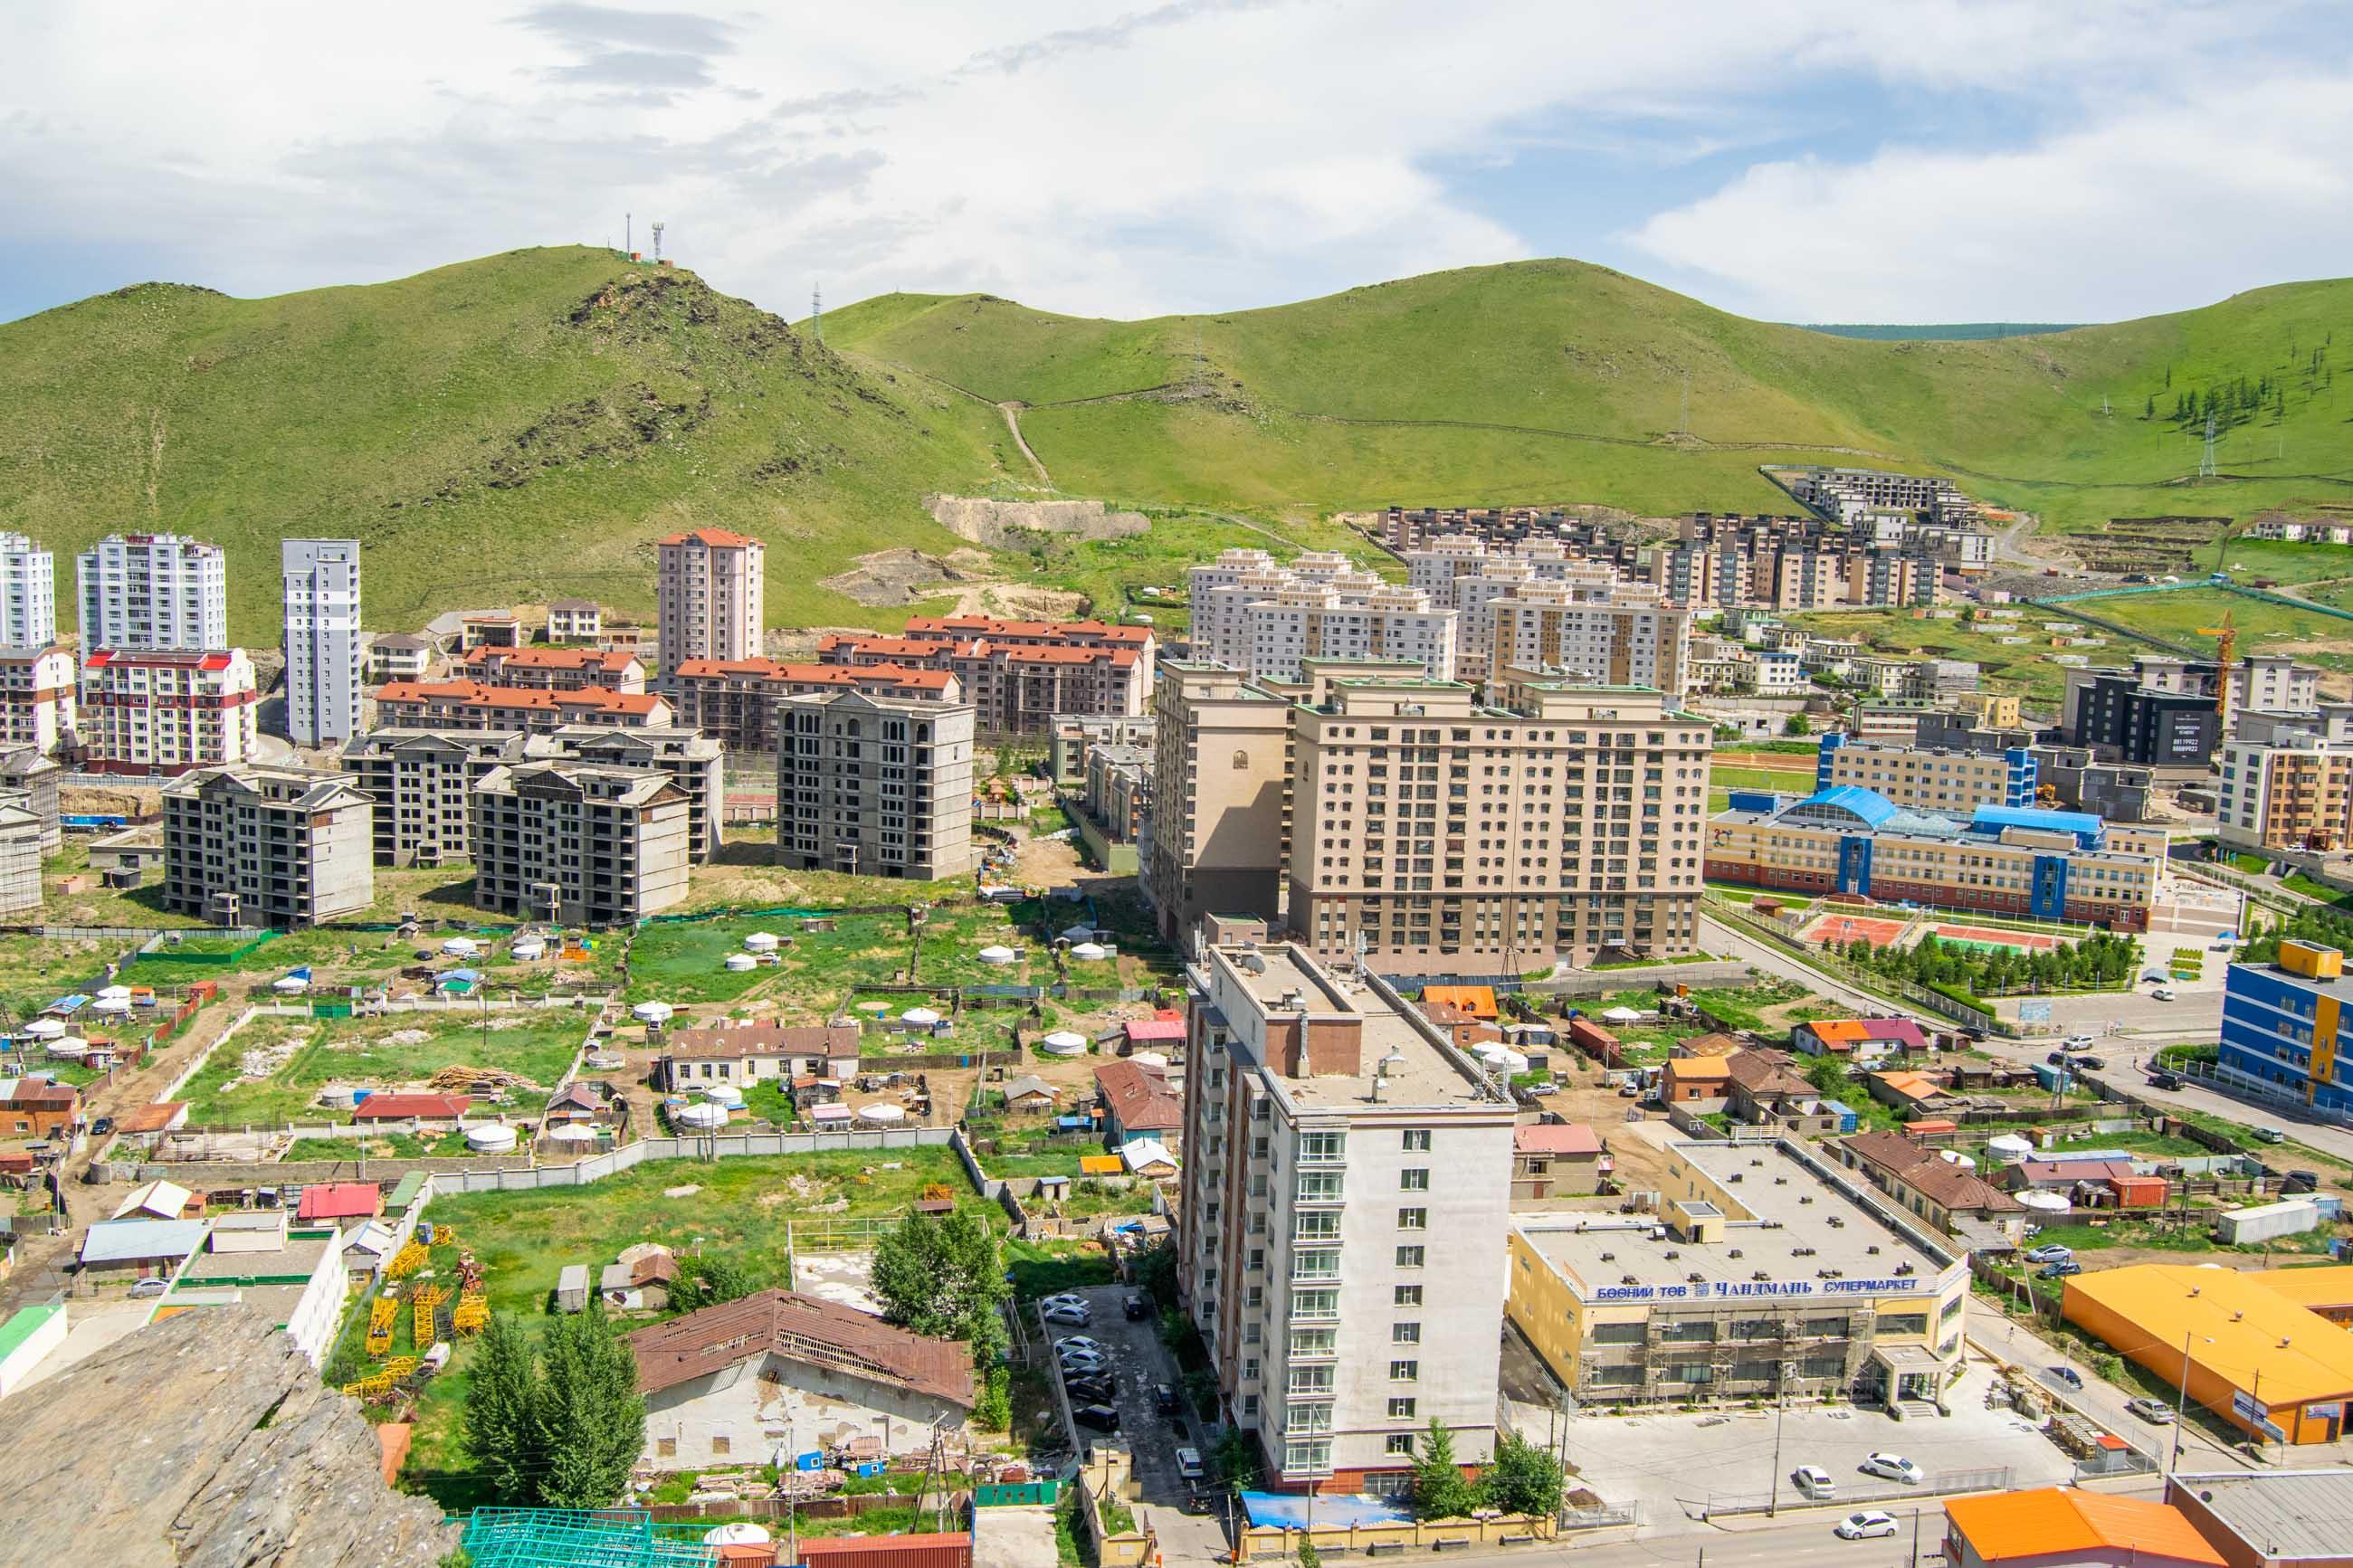 https://bubo.sk/uploads/galleries/4924/martinlipinsky_mongolsko_dsc0639.jpg